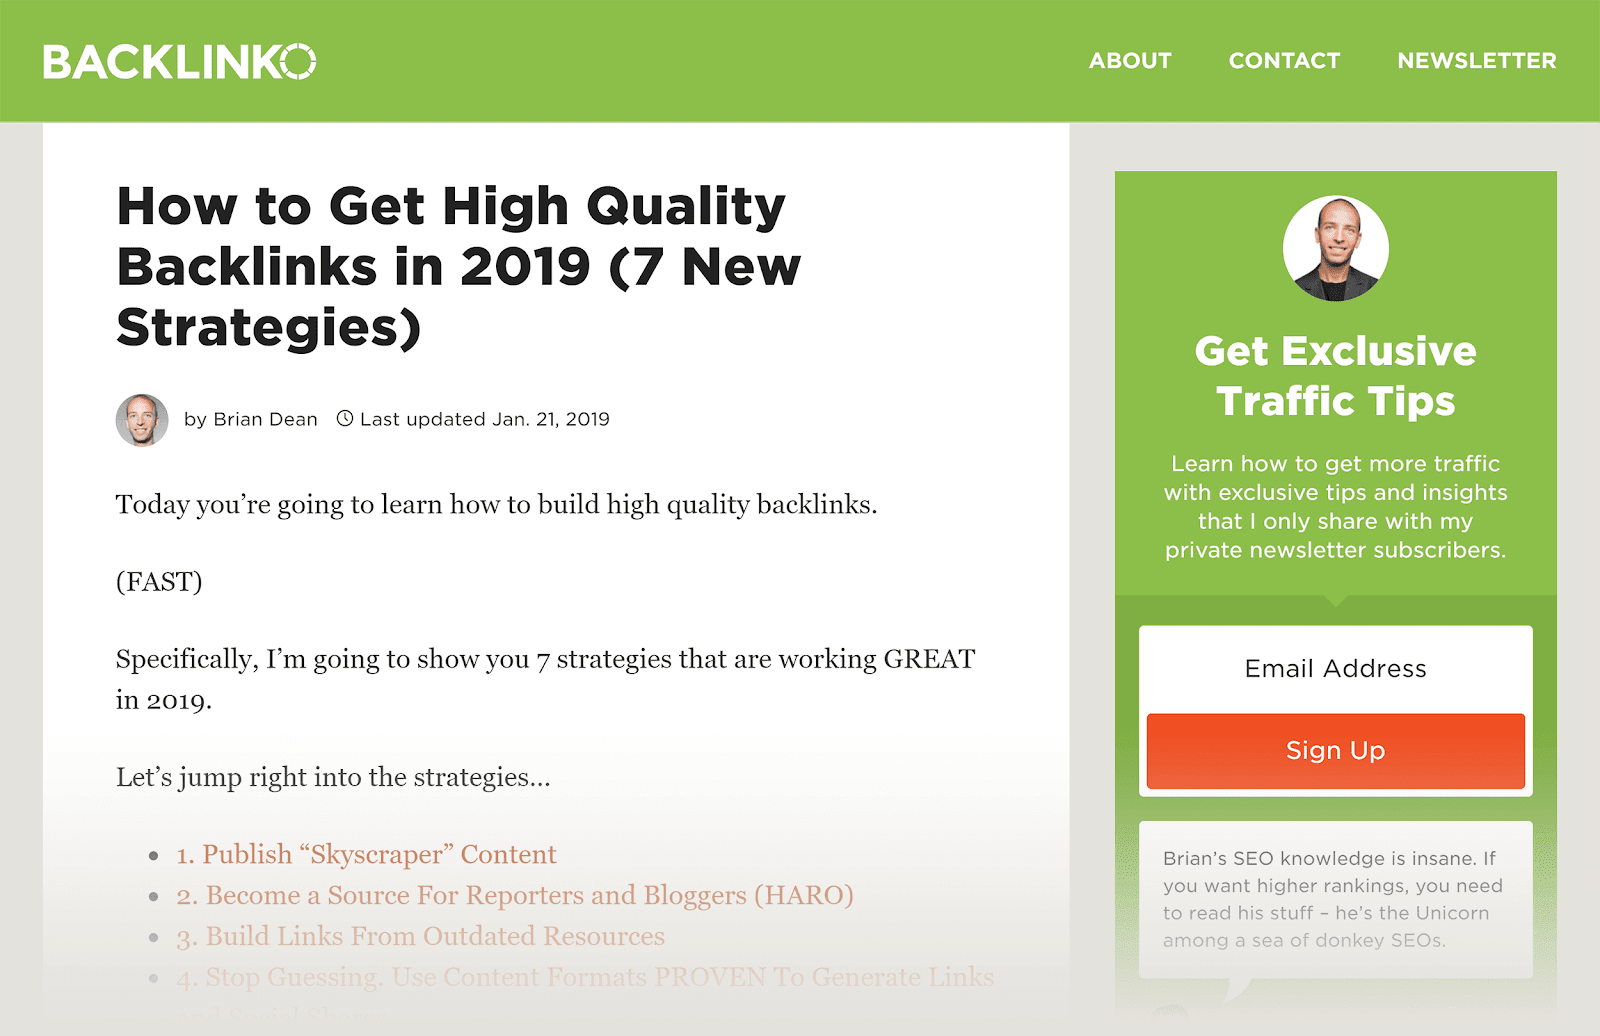 SEO content - Backlinko - Backlinks chất lượng cao